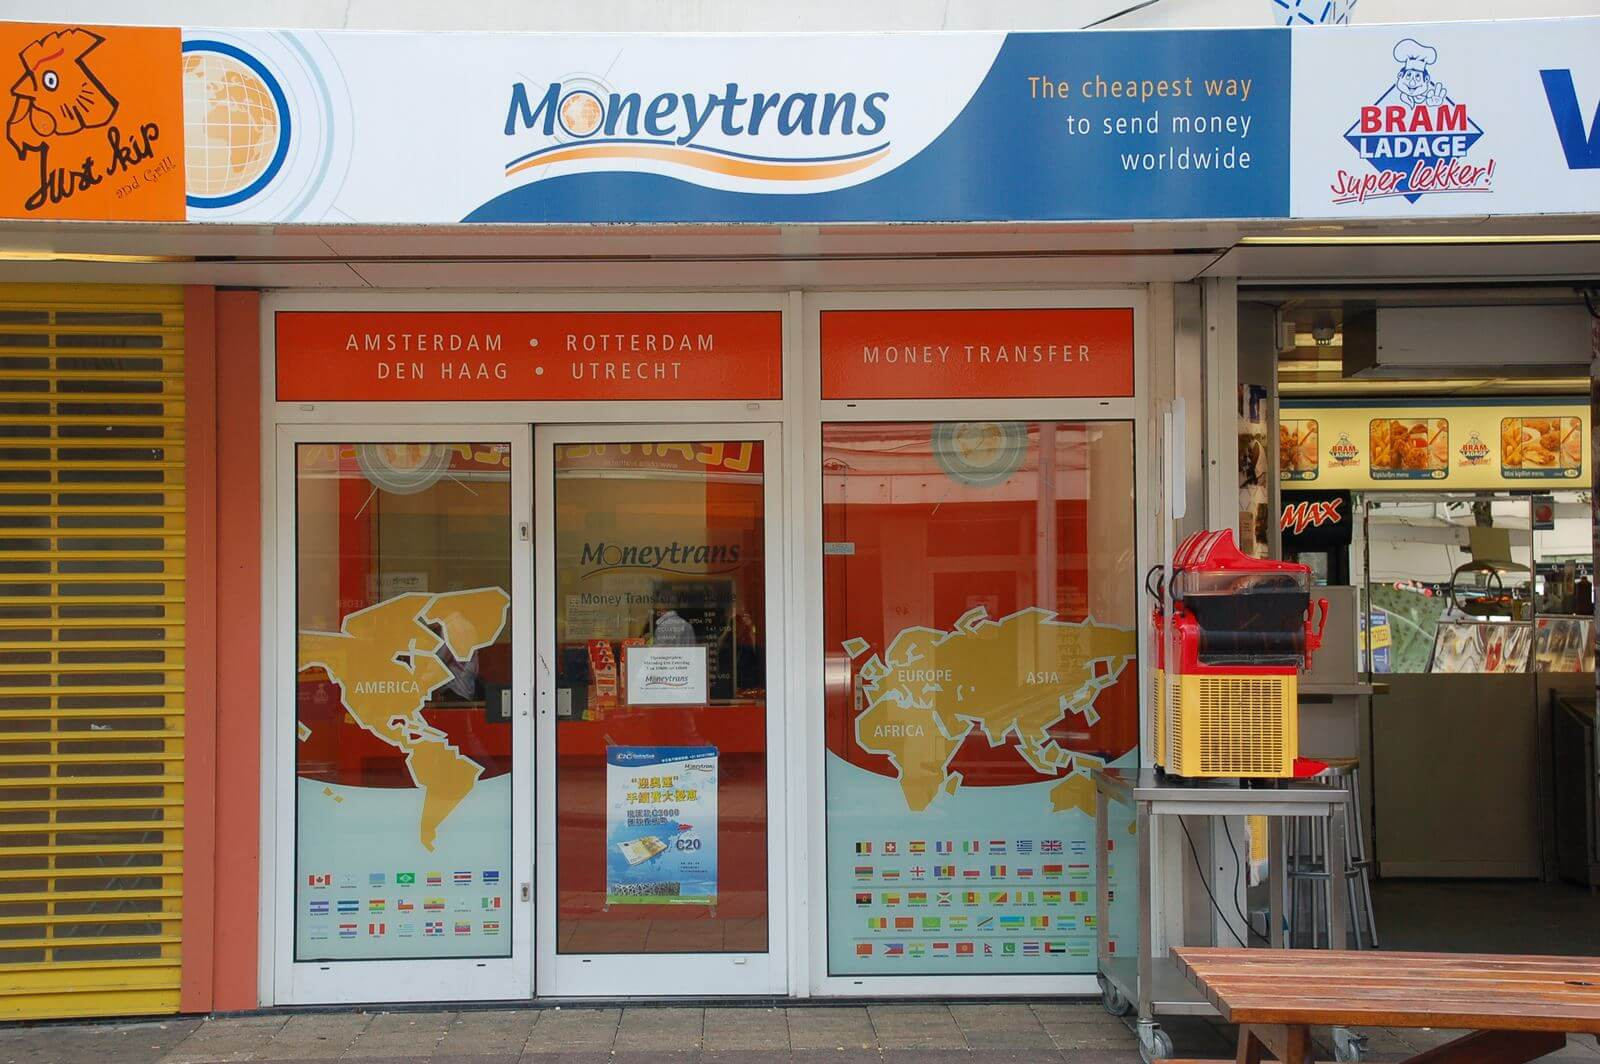 Moneytrans - Gevelreclame